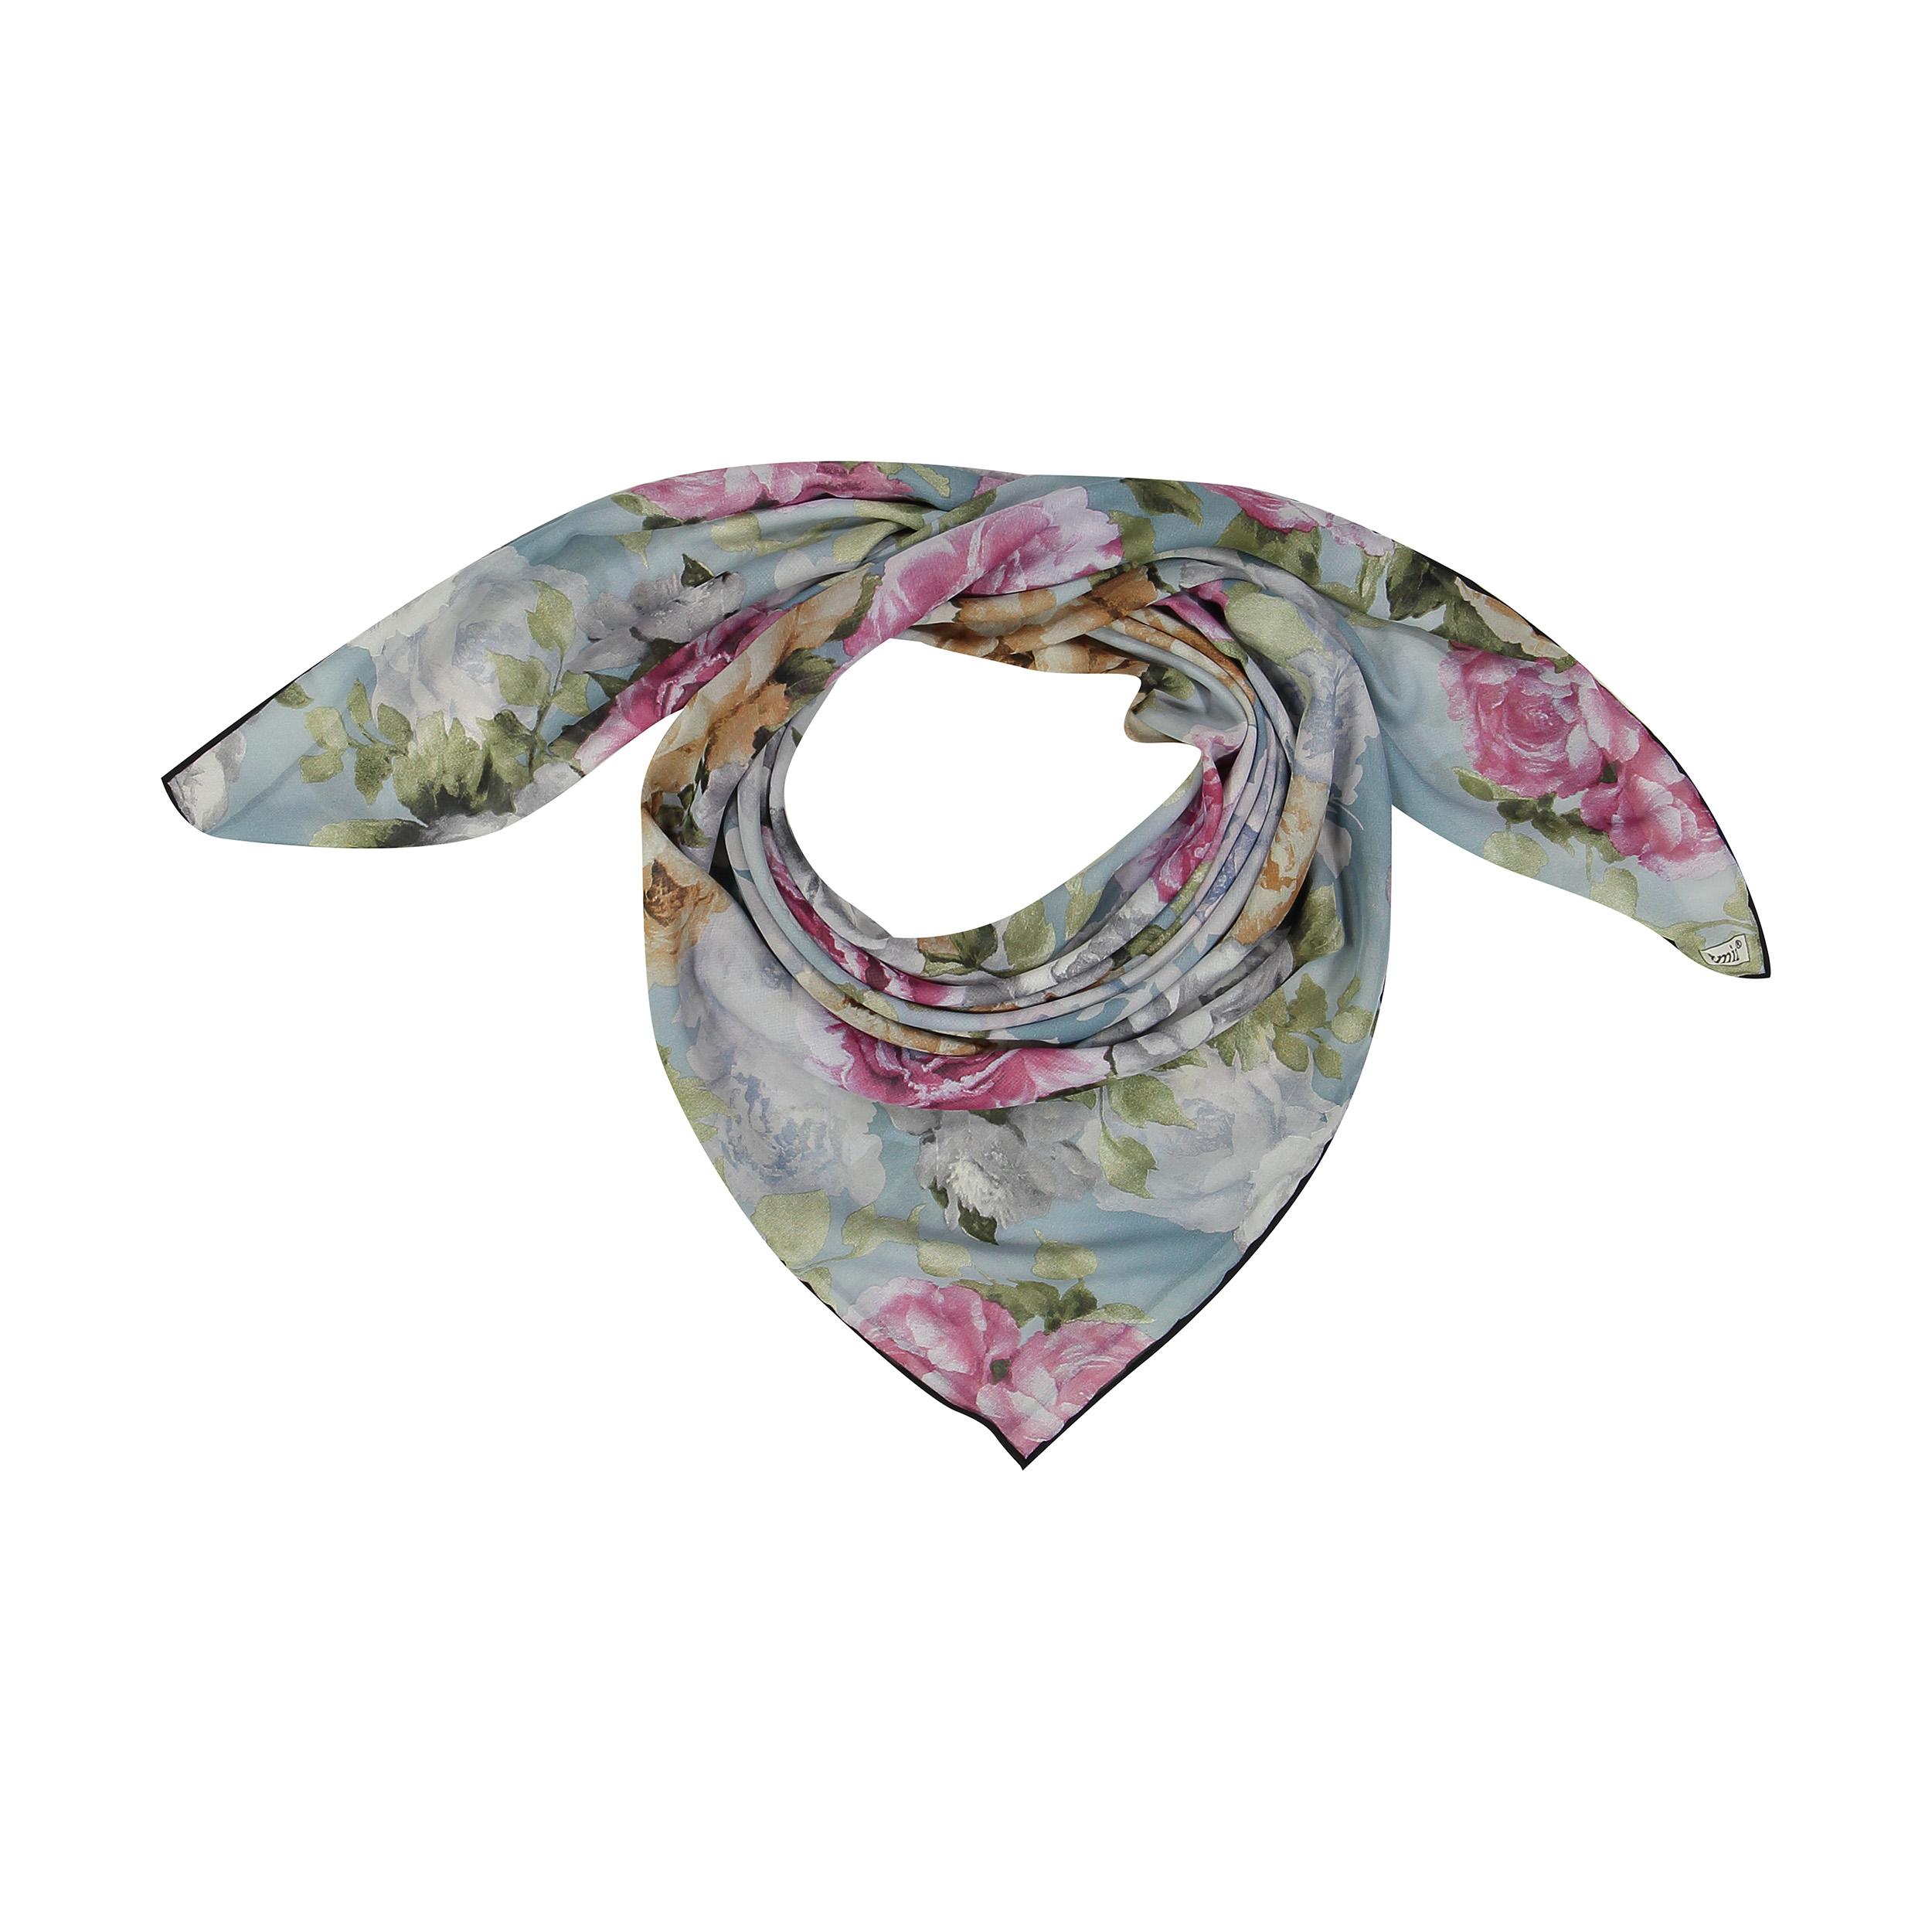 روسری زنانه لمیز طرح گلستان کد 356